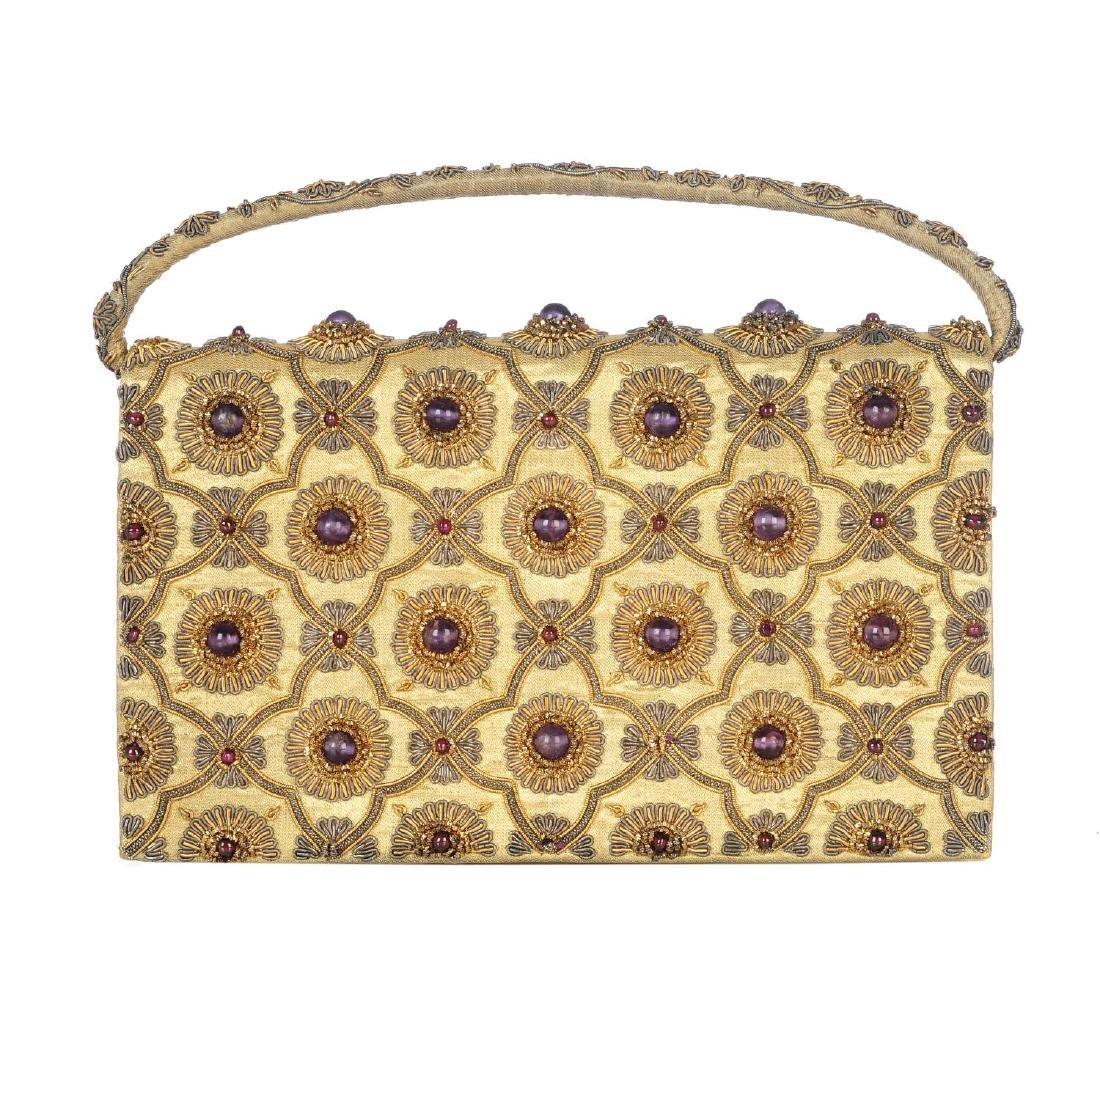 An early 20th century gem-set evening handbag